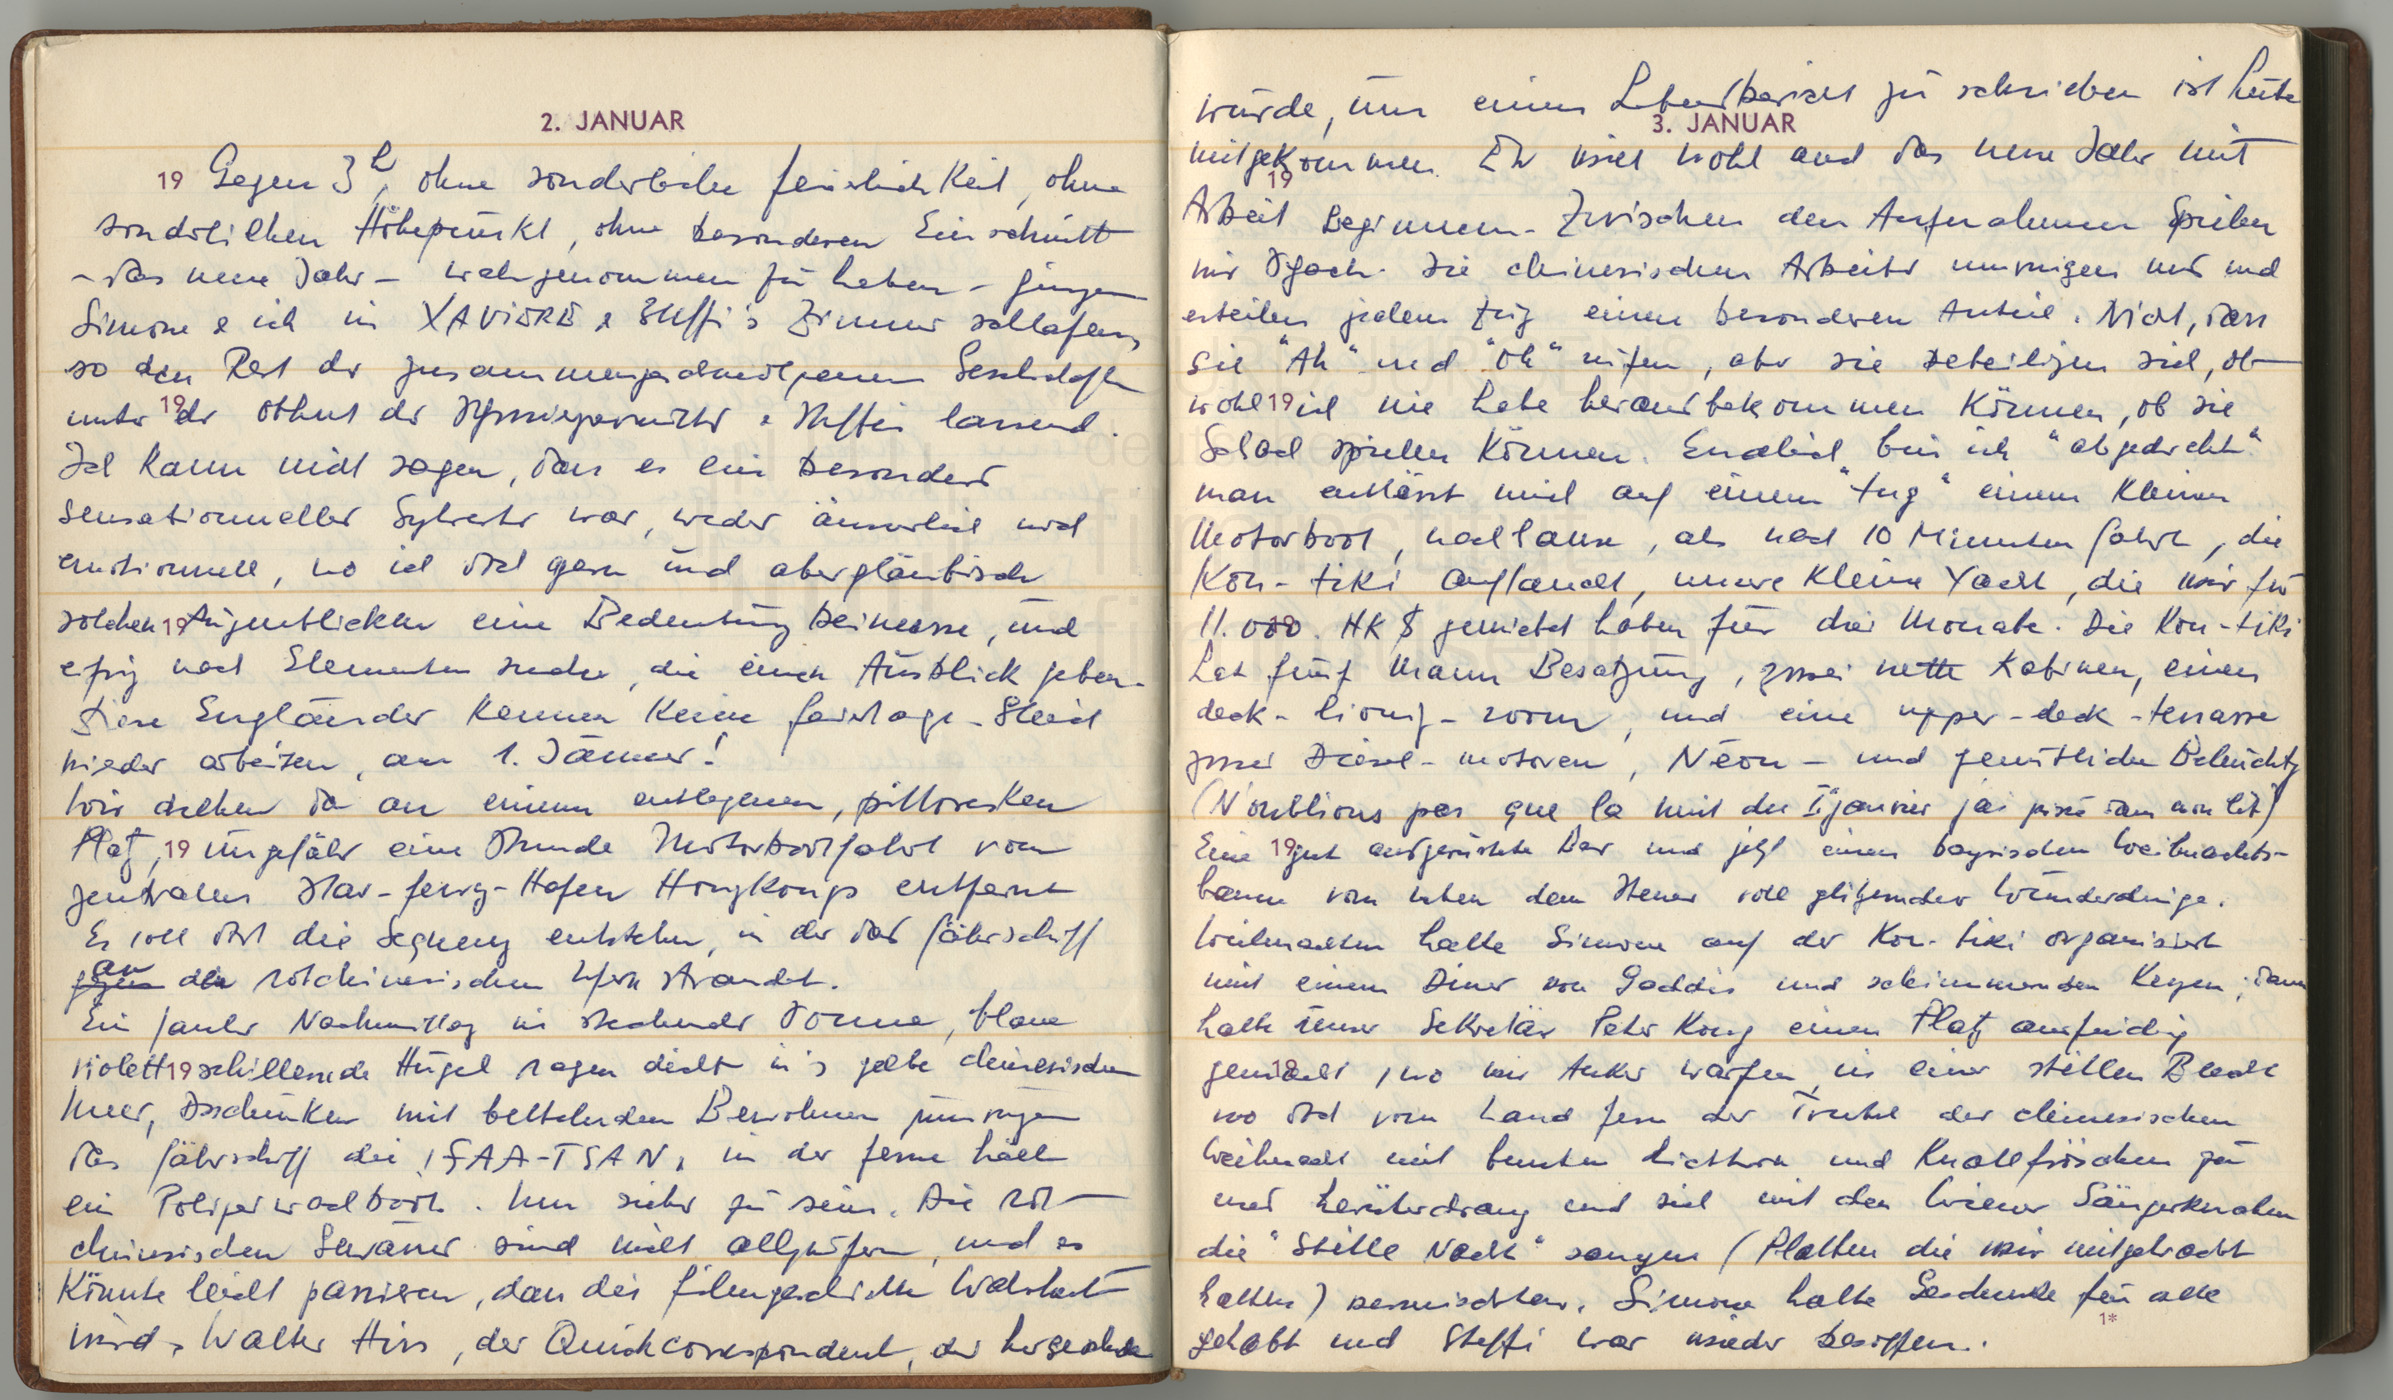 Tagebucheintrag vom 2.1.1959